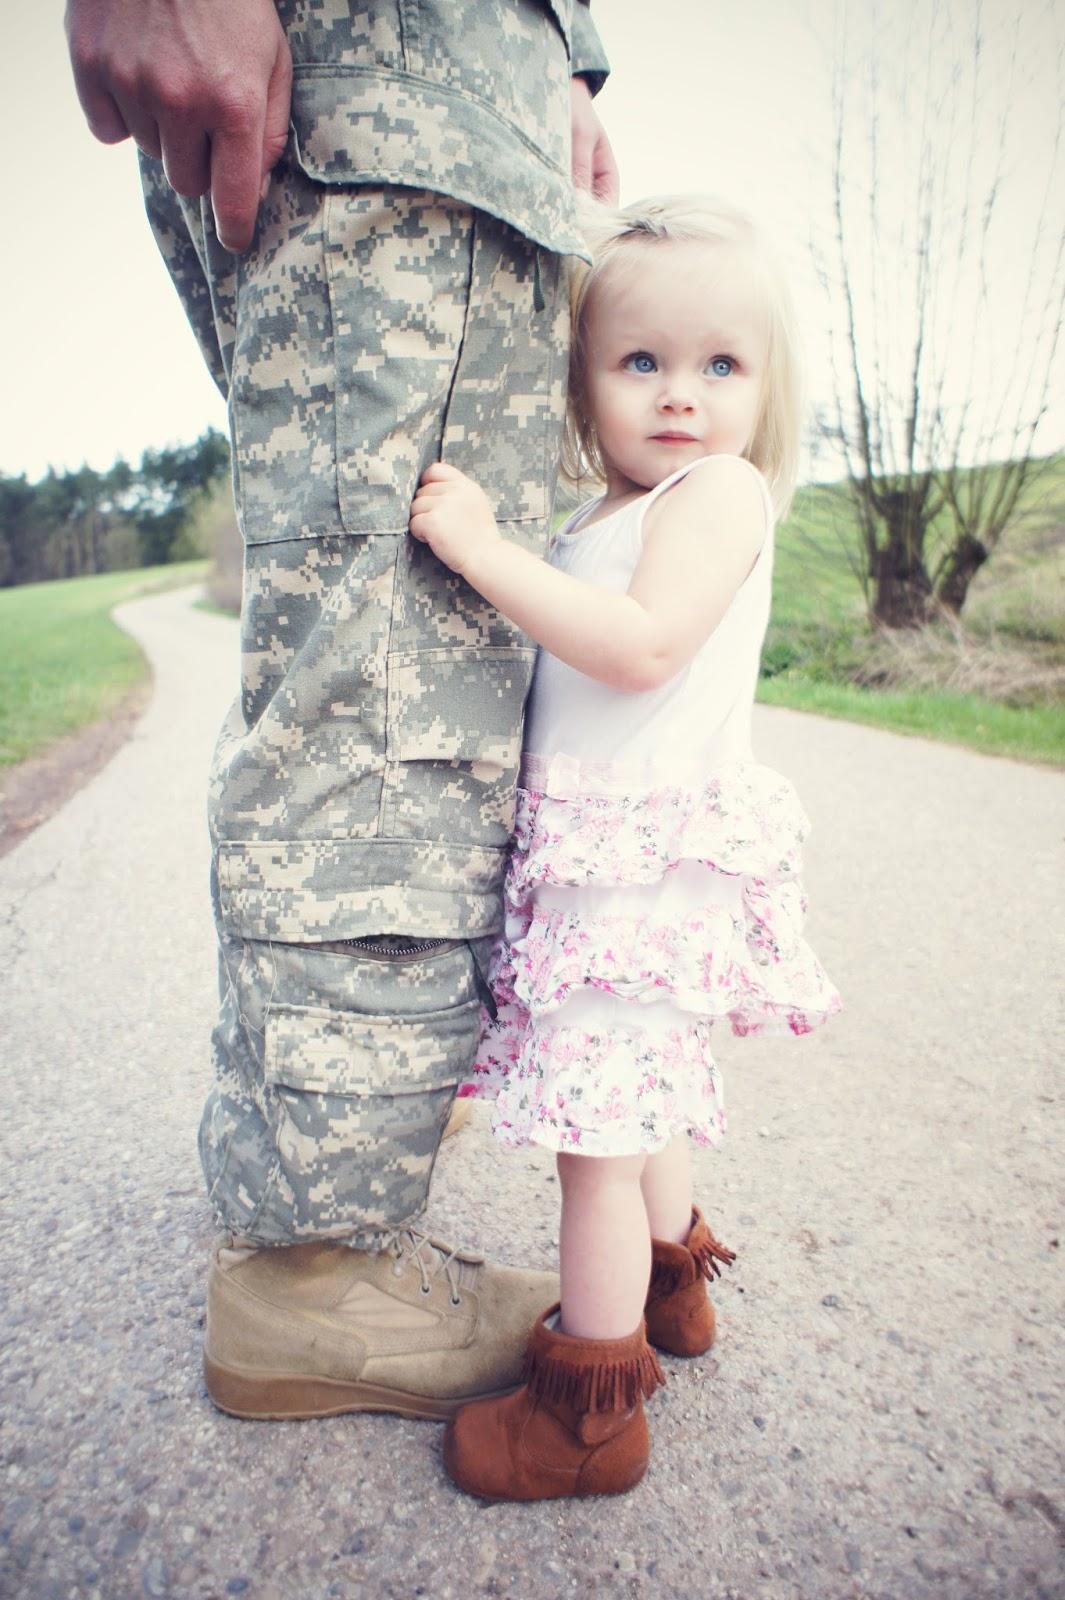 Daddy-daughter-love-wallpaper-wp3004791